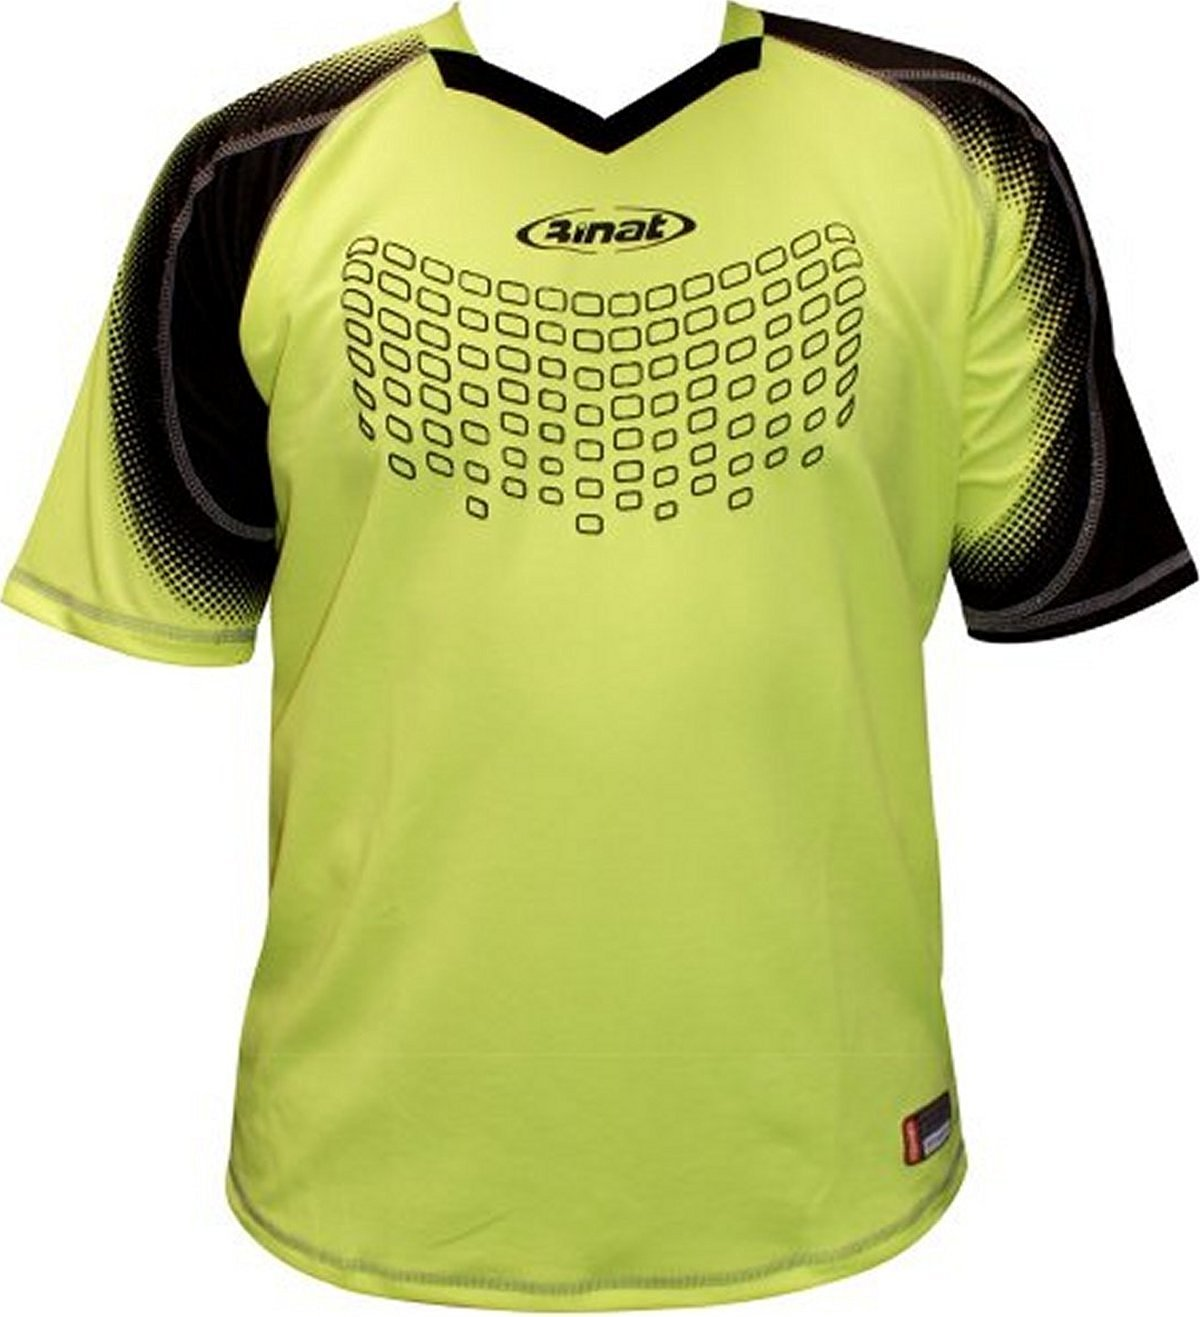 d170ea5eb72 Get Quotations · Rinat Scarpado Short Sleeve Goalkeeper Jersey - Neon Yellow